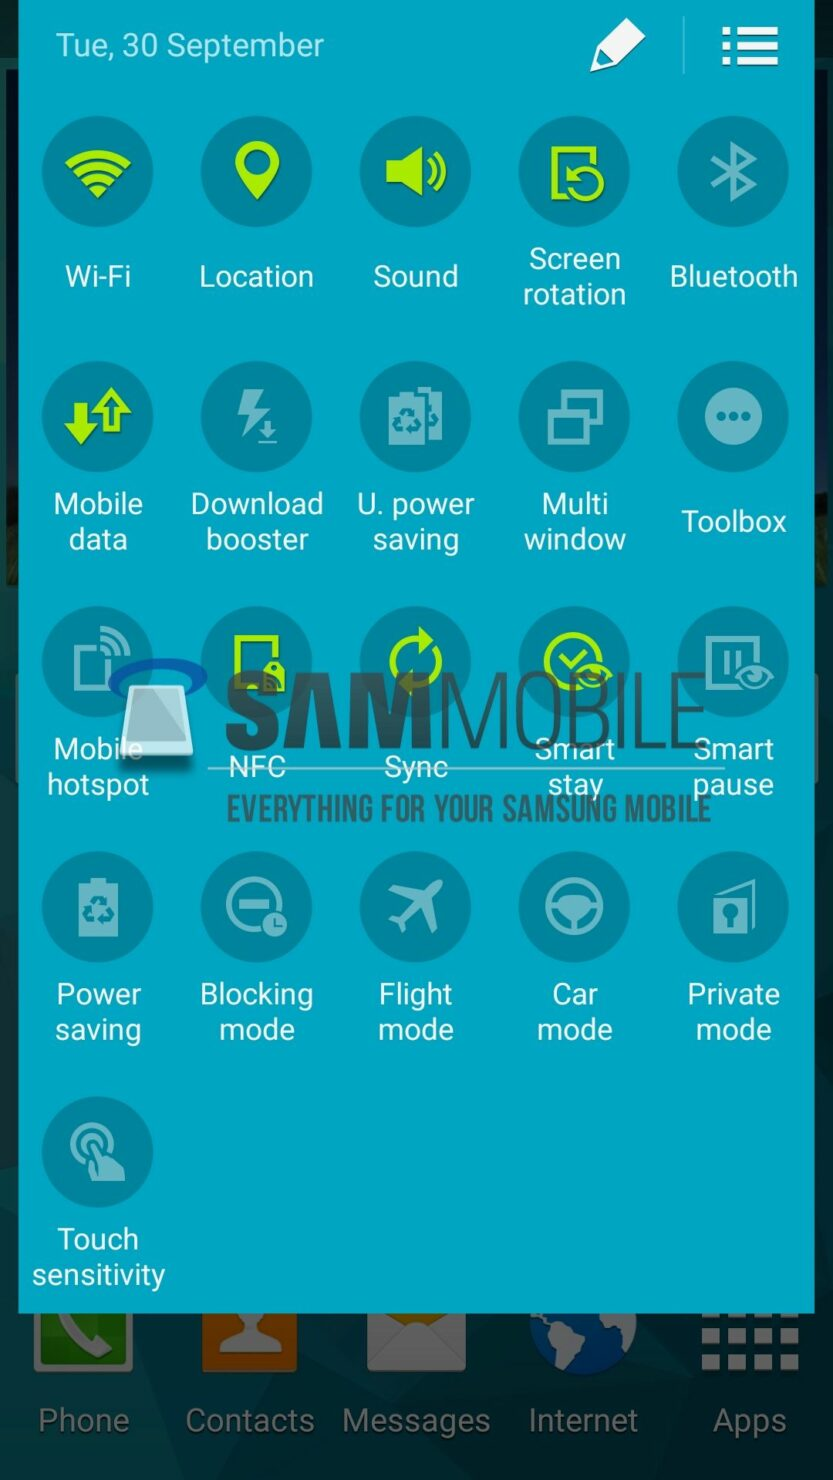 samsung-galaxy-s5-running-android-lollipop-5